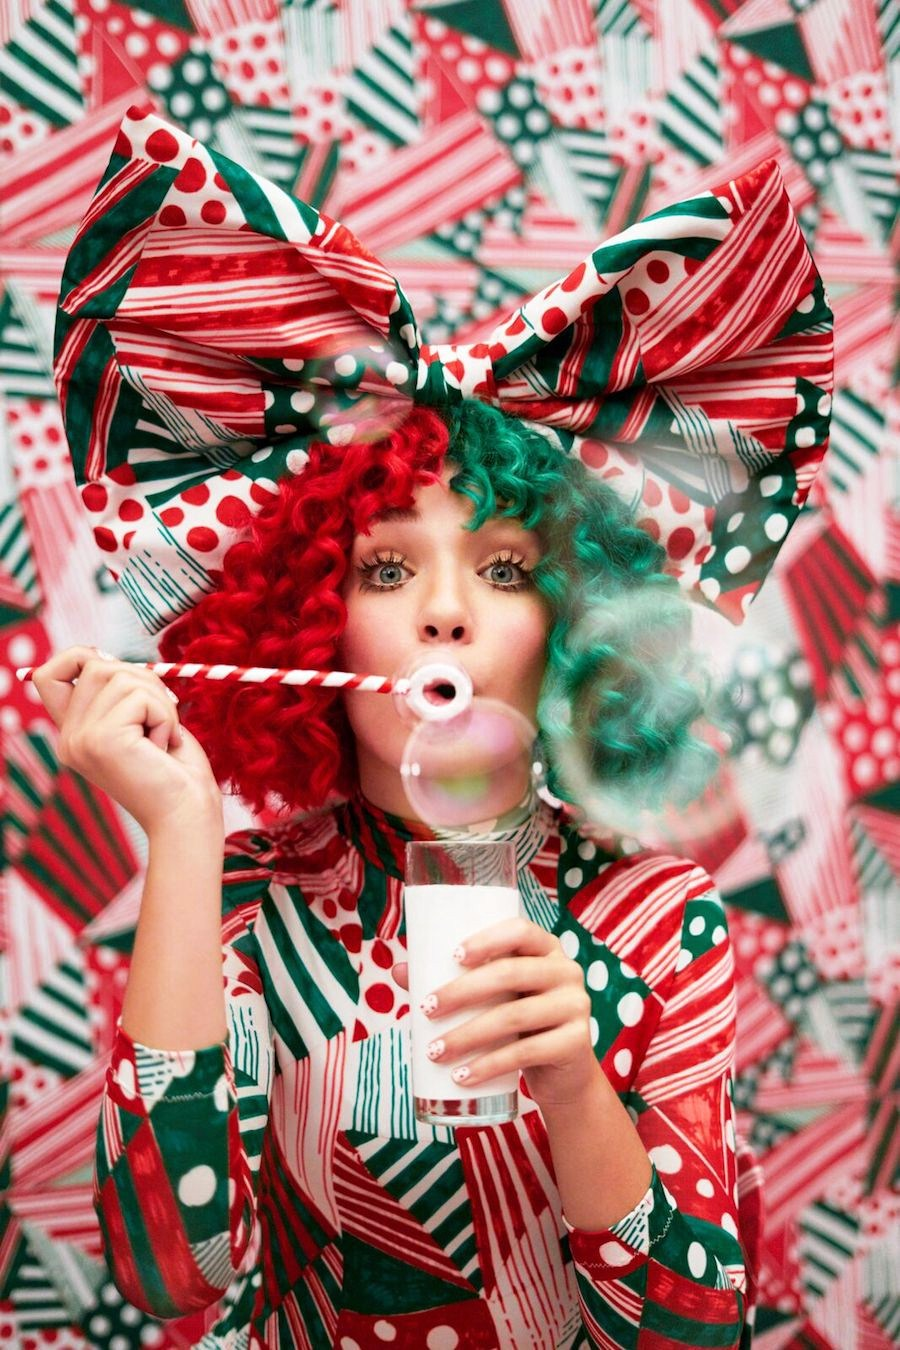 Everyday Is Christmas.Everyday Is Christmas Promo Pics Sia Foto 40900660 Fanpop